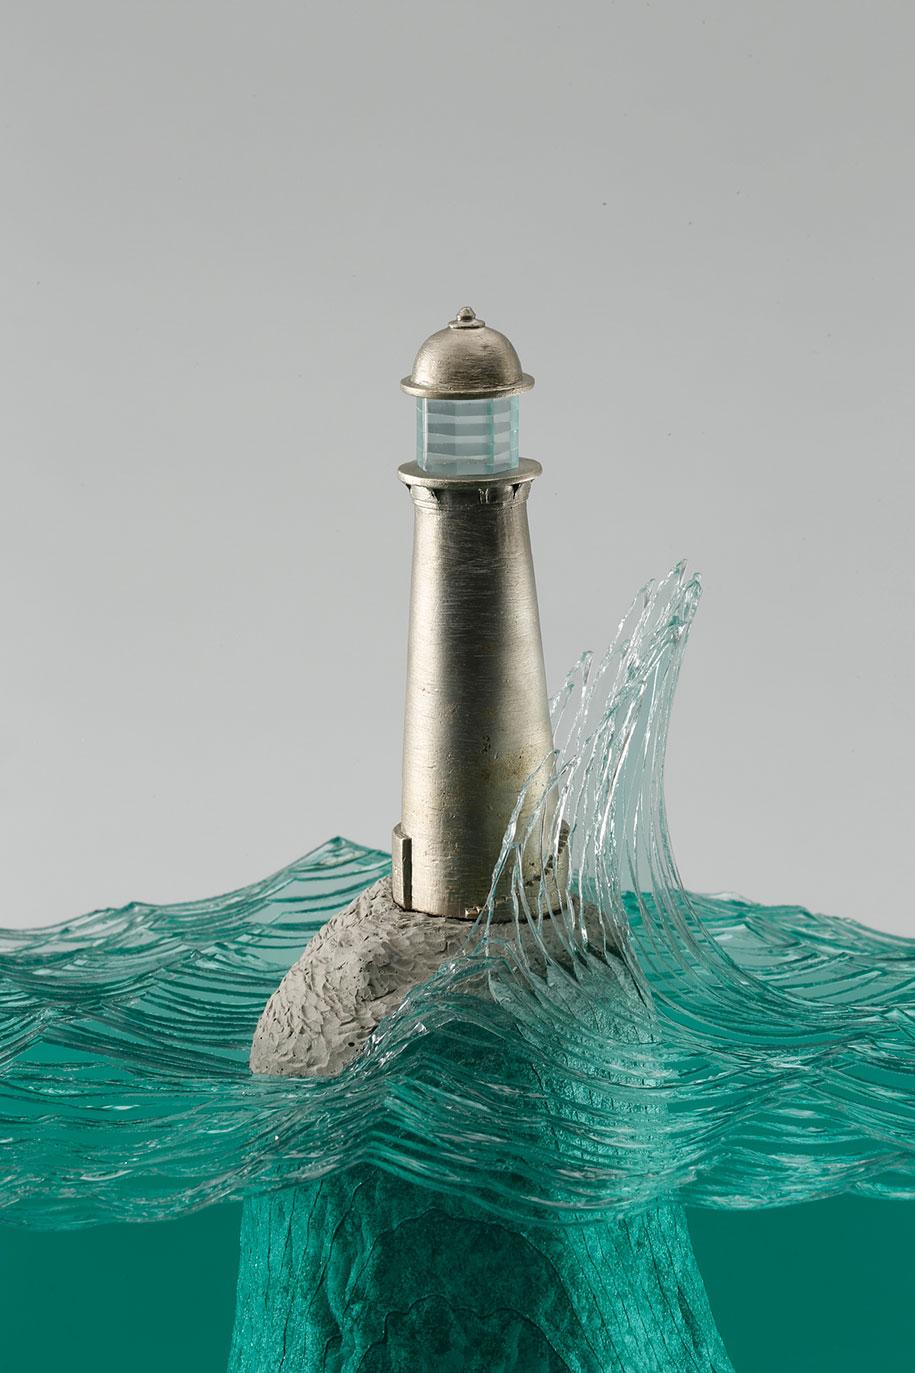 layered-glass-sculptures-ben-young-14